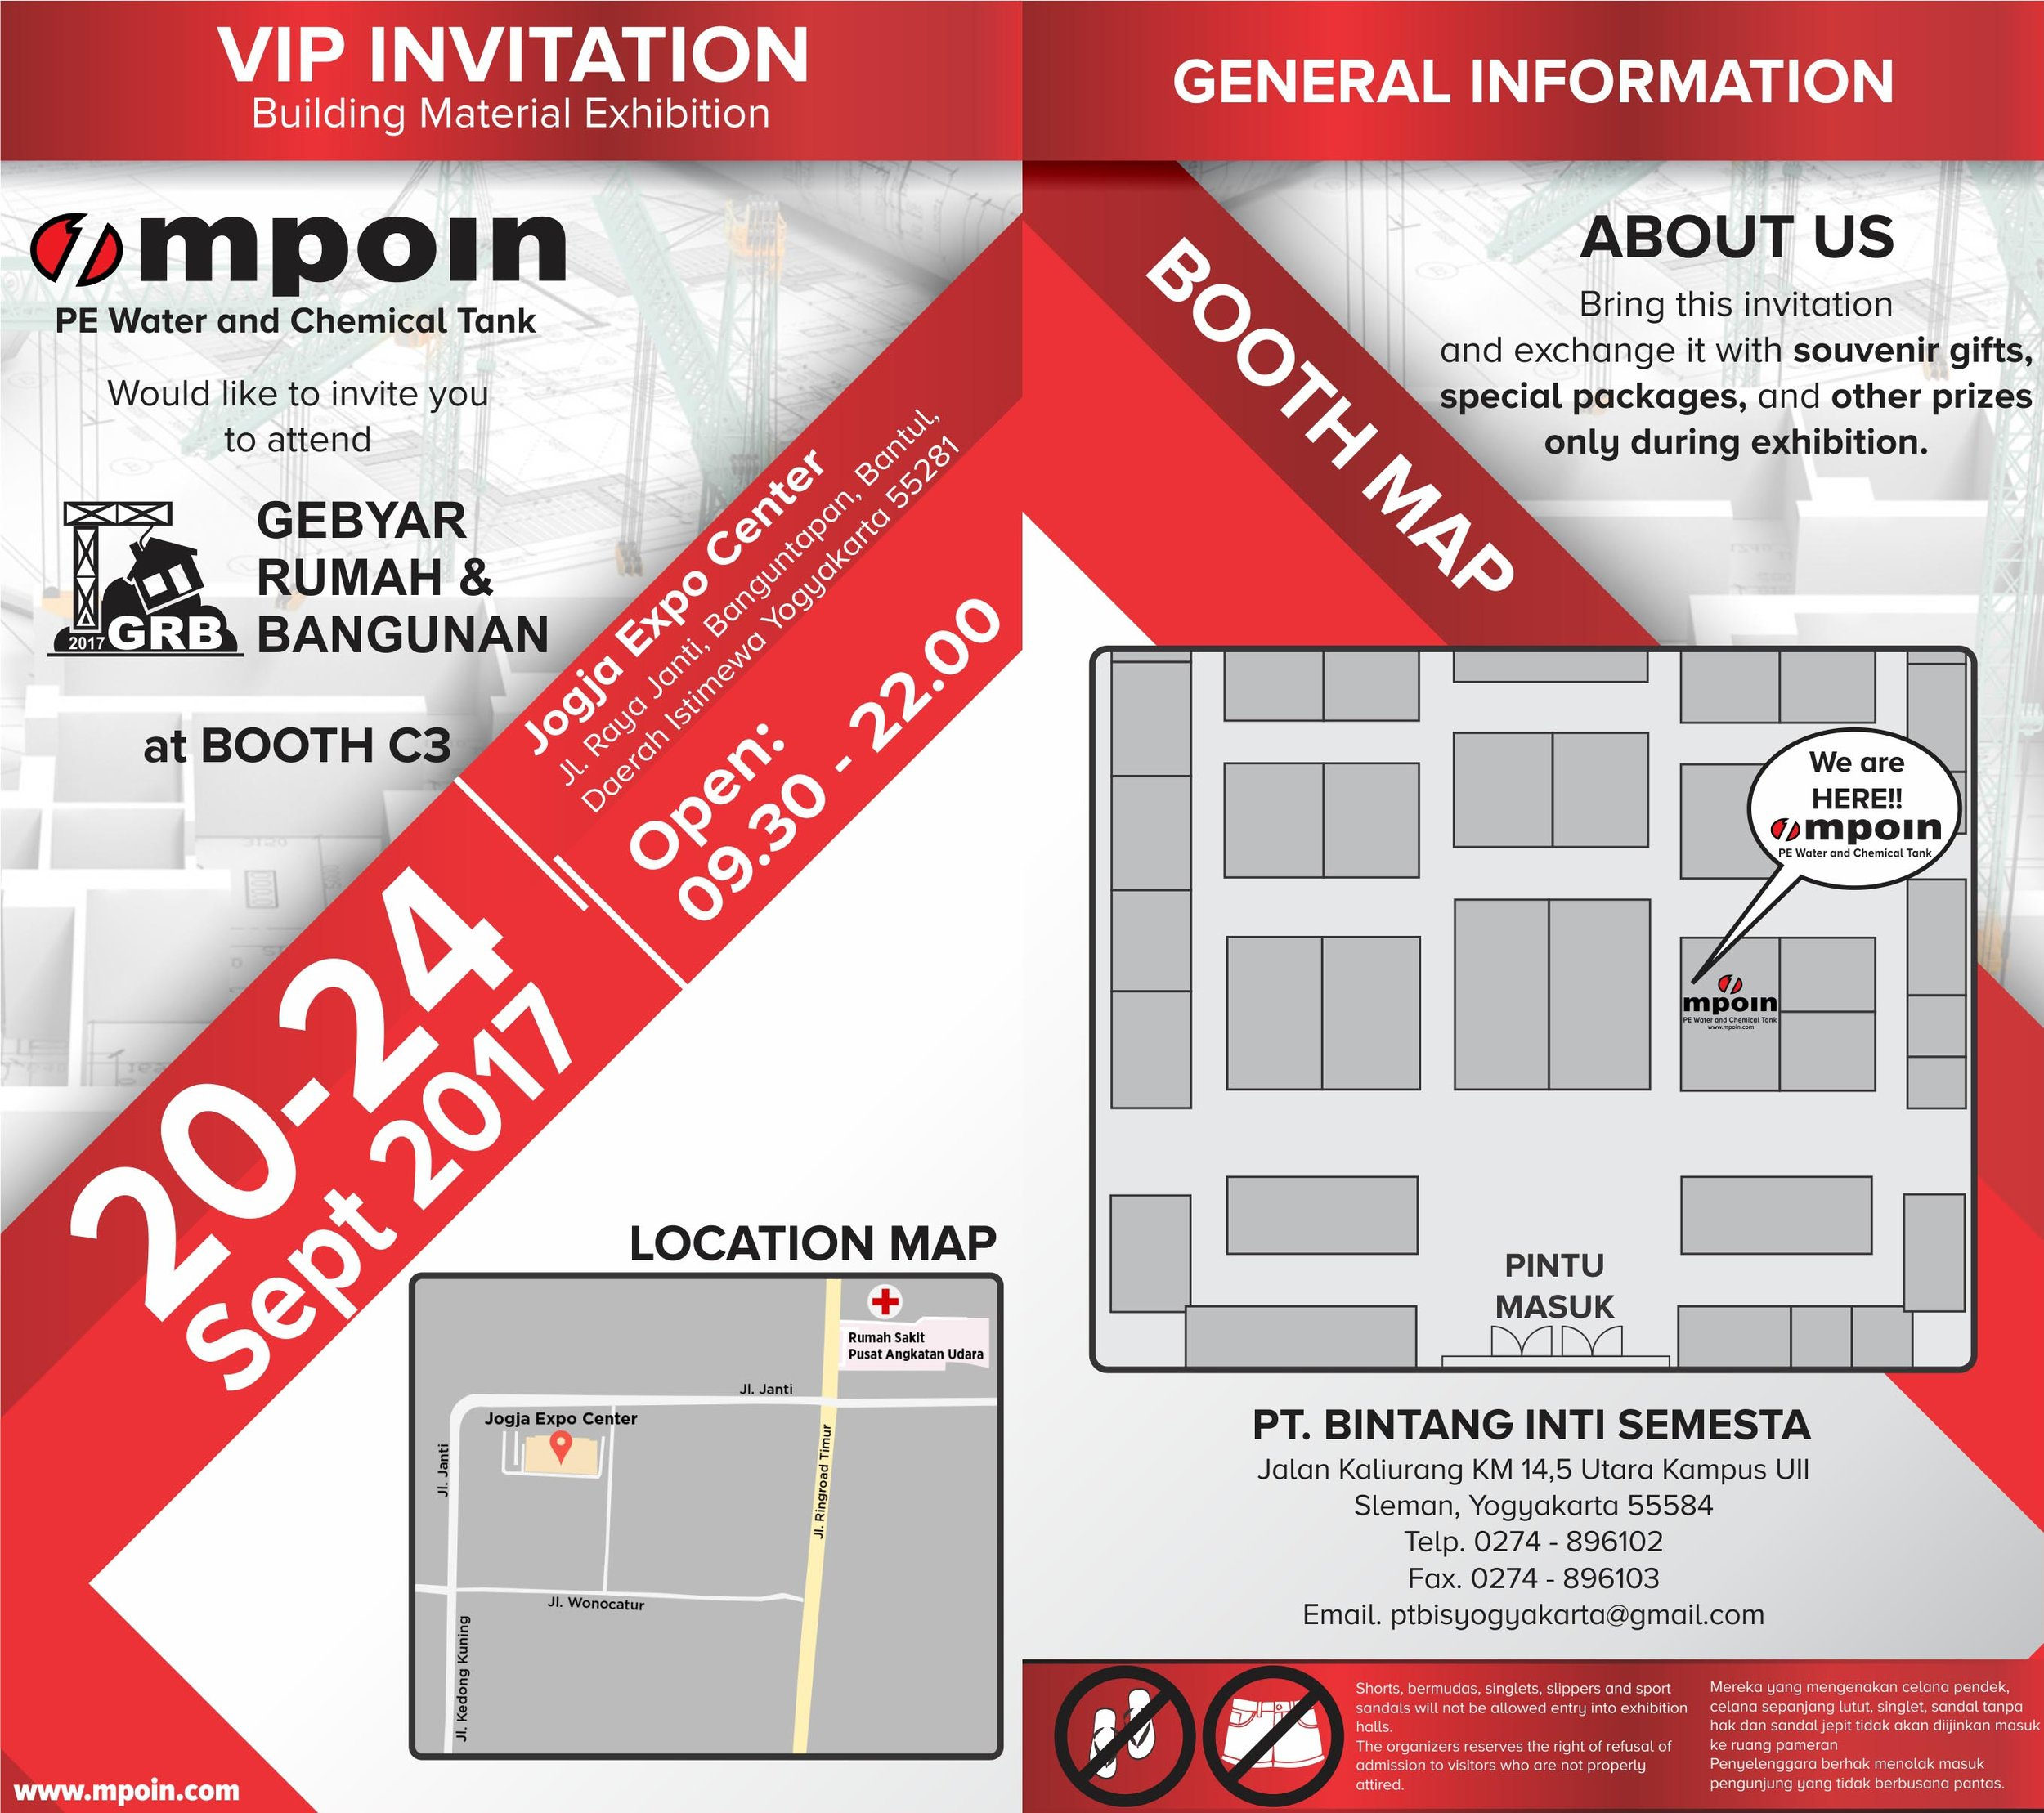 Tangki Air MPOIN PLus Pameran Jogja Expo Center